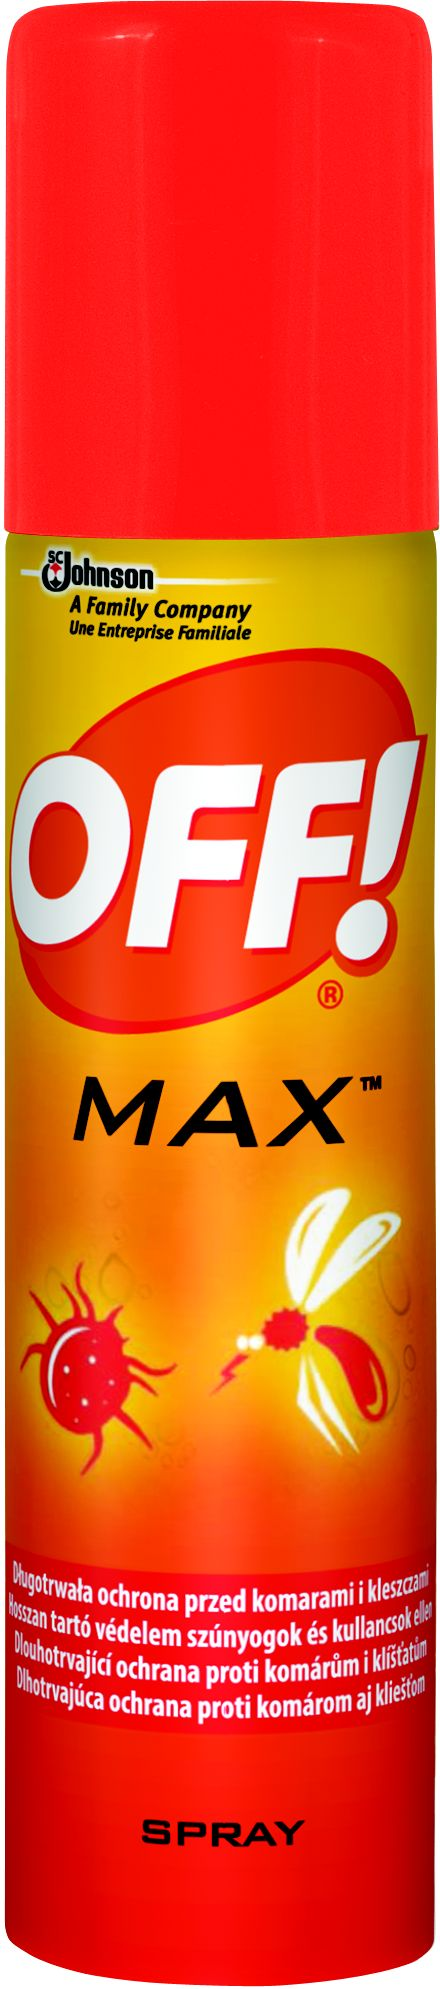 OFF! Max spray 100 ml